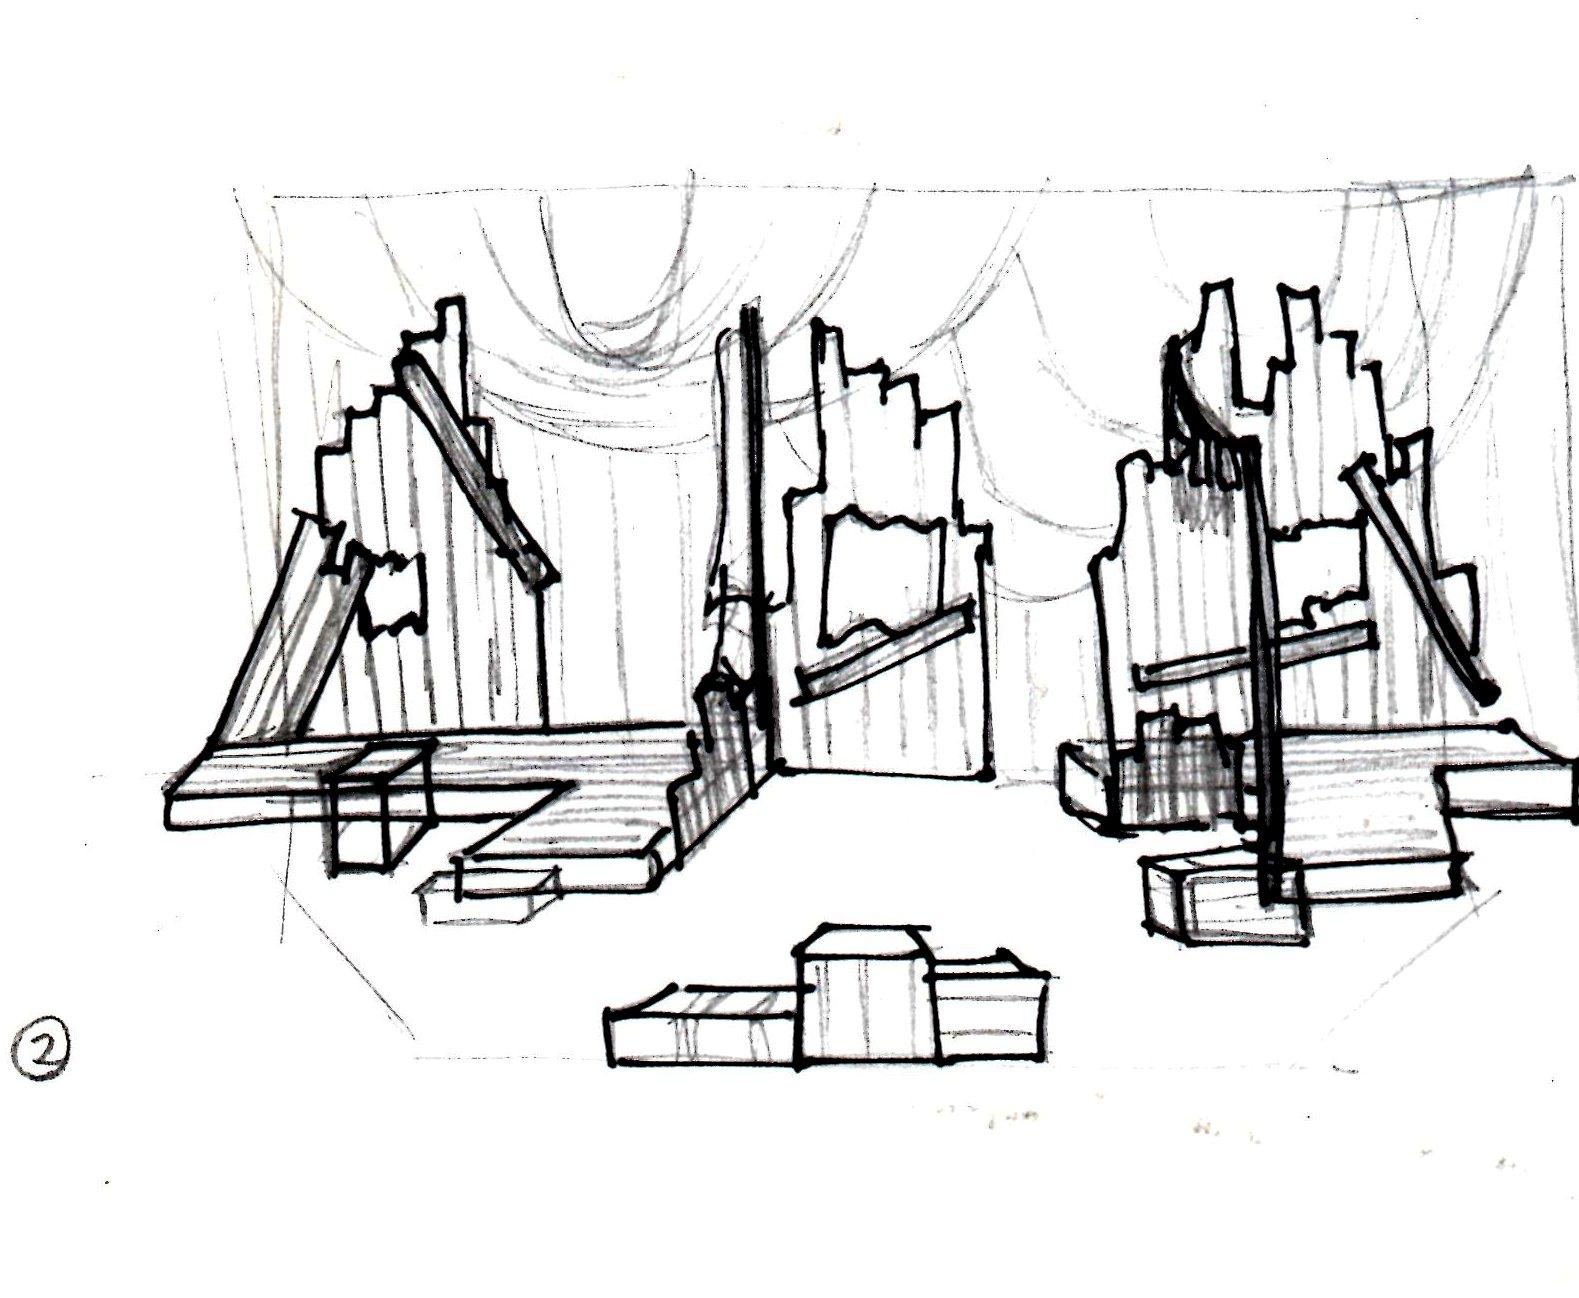 Developmental Sketch